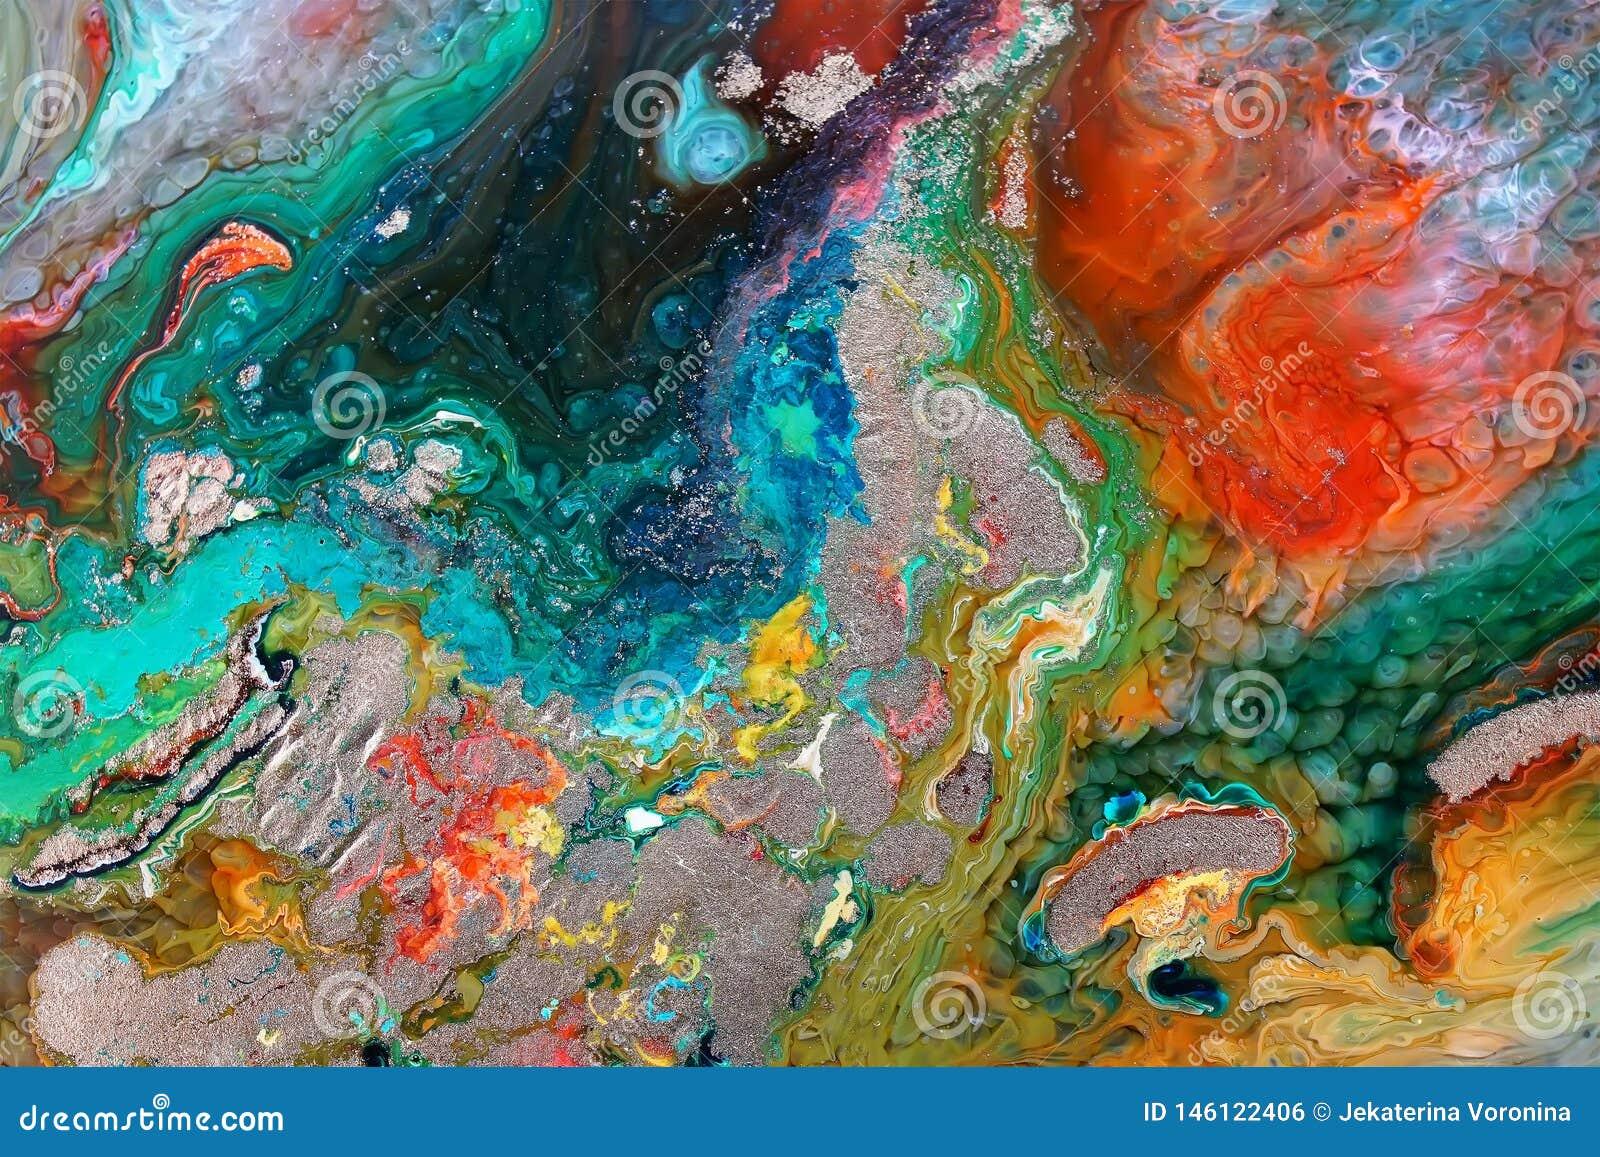 Epoxy Resin Petri Dish Art stock photo  Image of artistic - 146122406